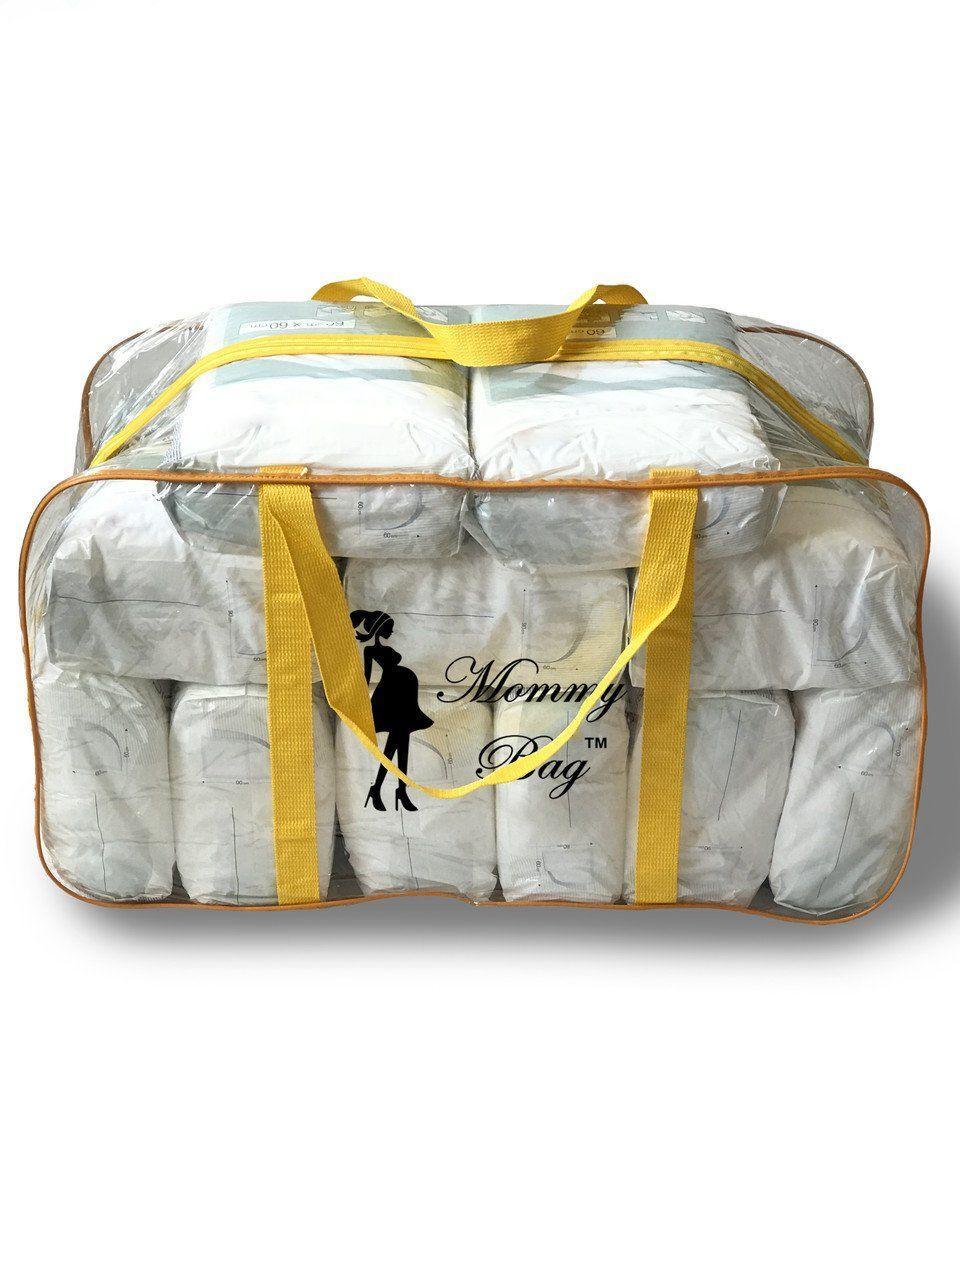 Сумка прозрачная в роддом Mommy Bag, размер - XL, цвет - Жёлтый